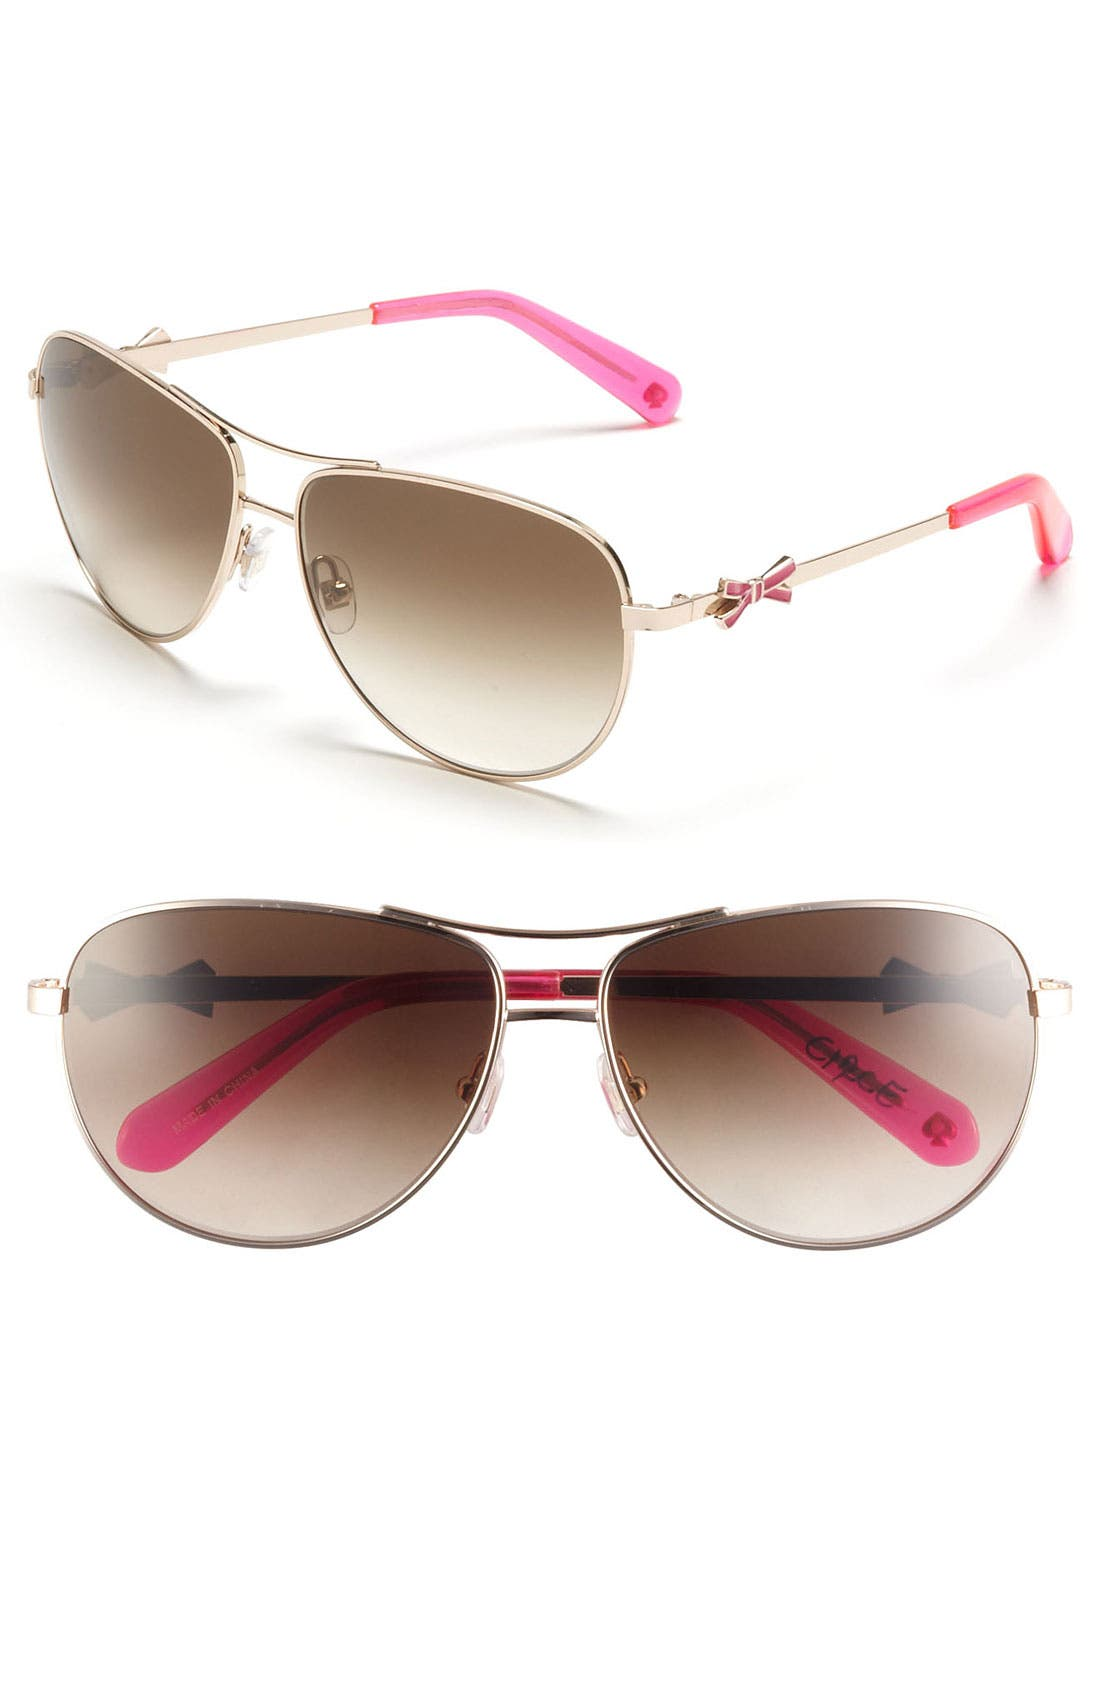 Main Image - kate spade new york 'circe' 59mm metal aviator sunglasses